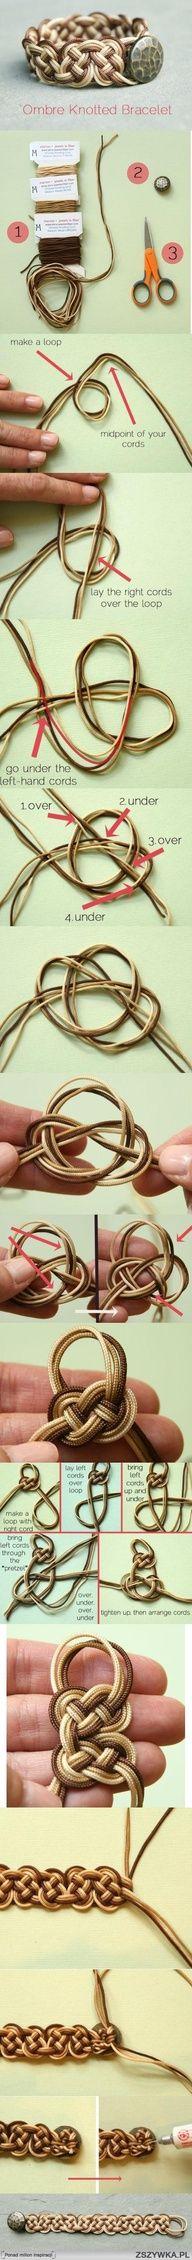 "ombre celtic knot bracelet"" data-componentType=""MODAL_PIN"